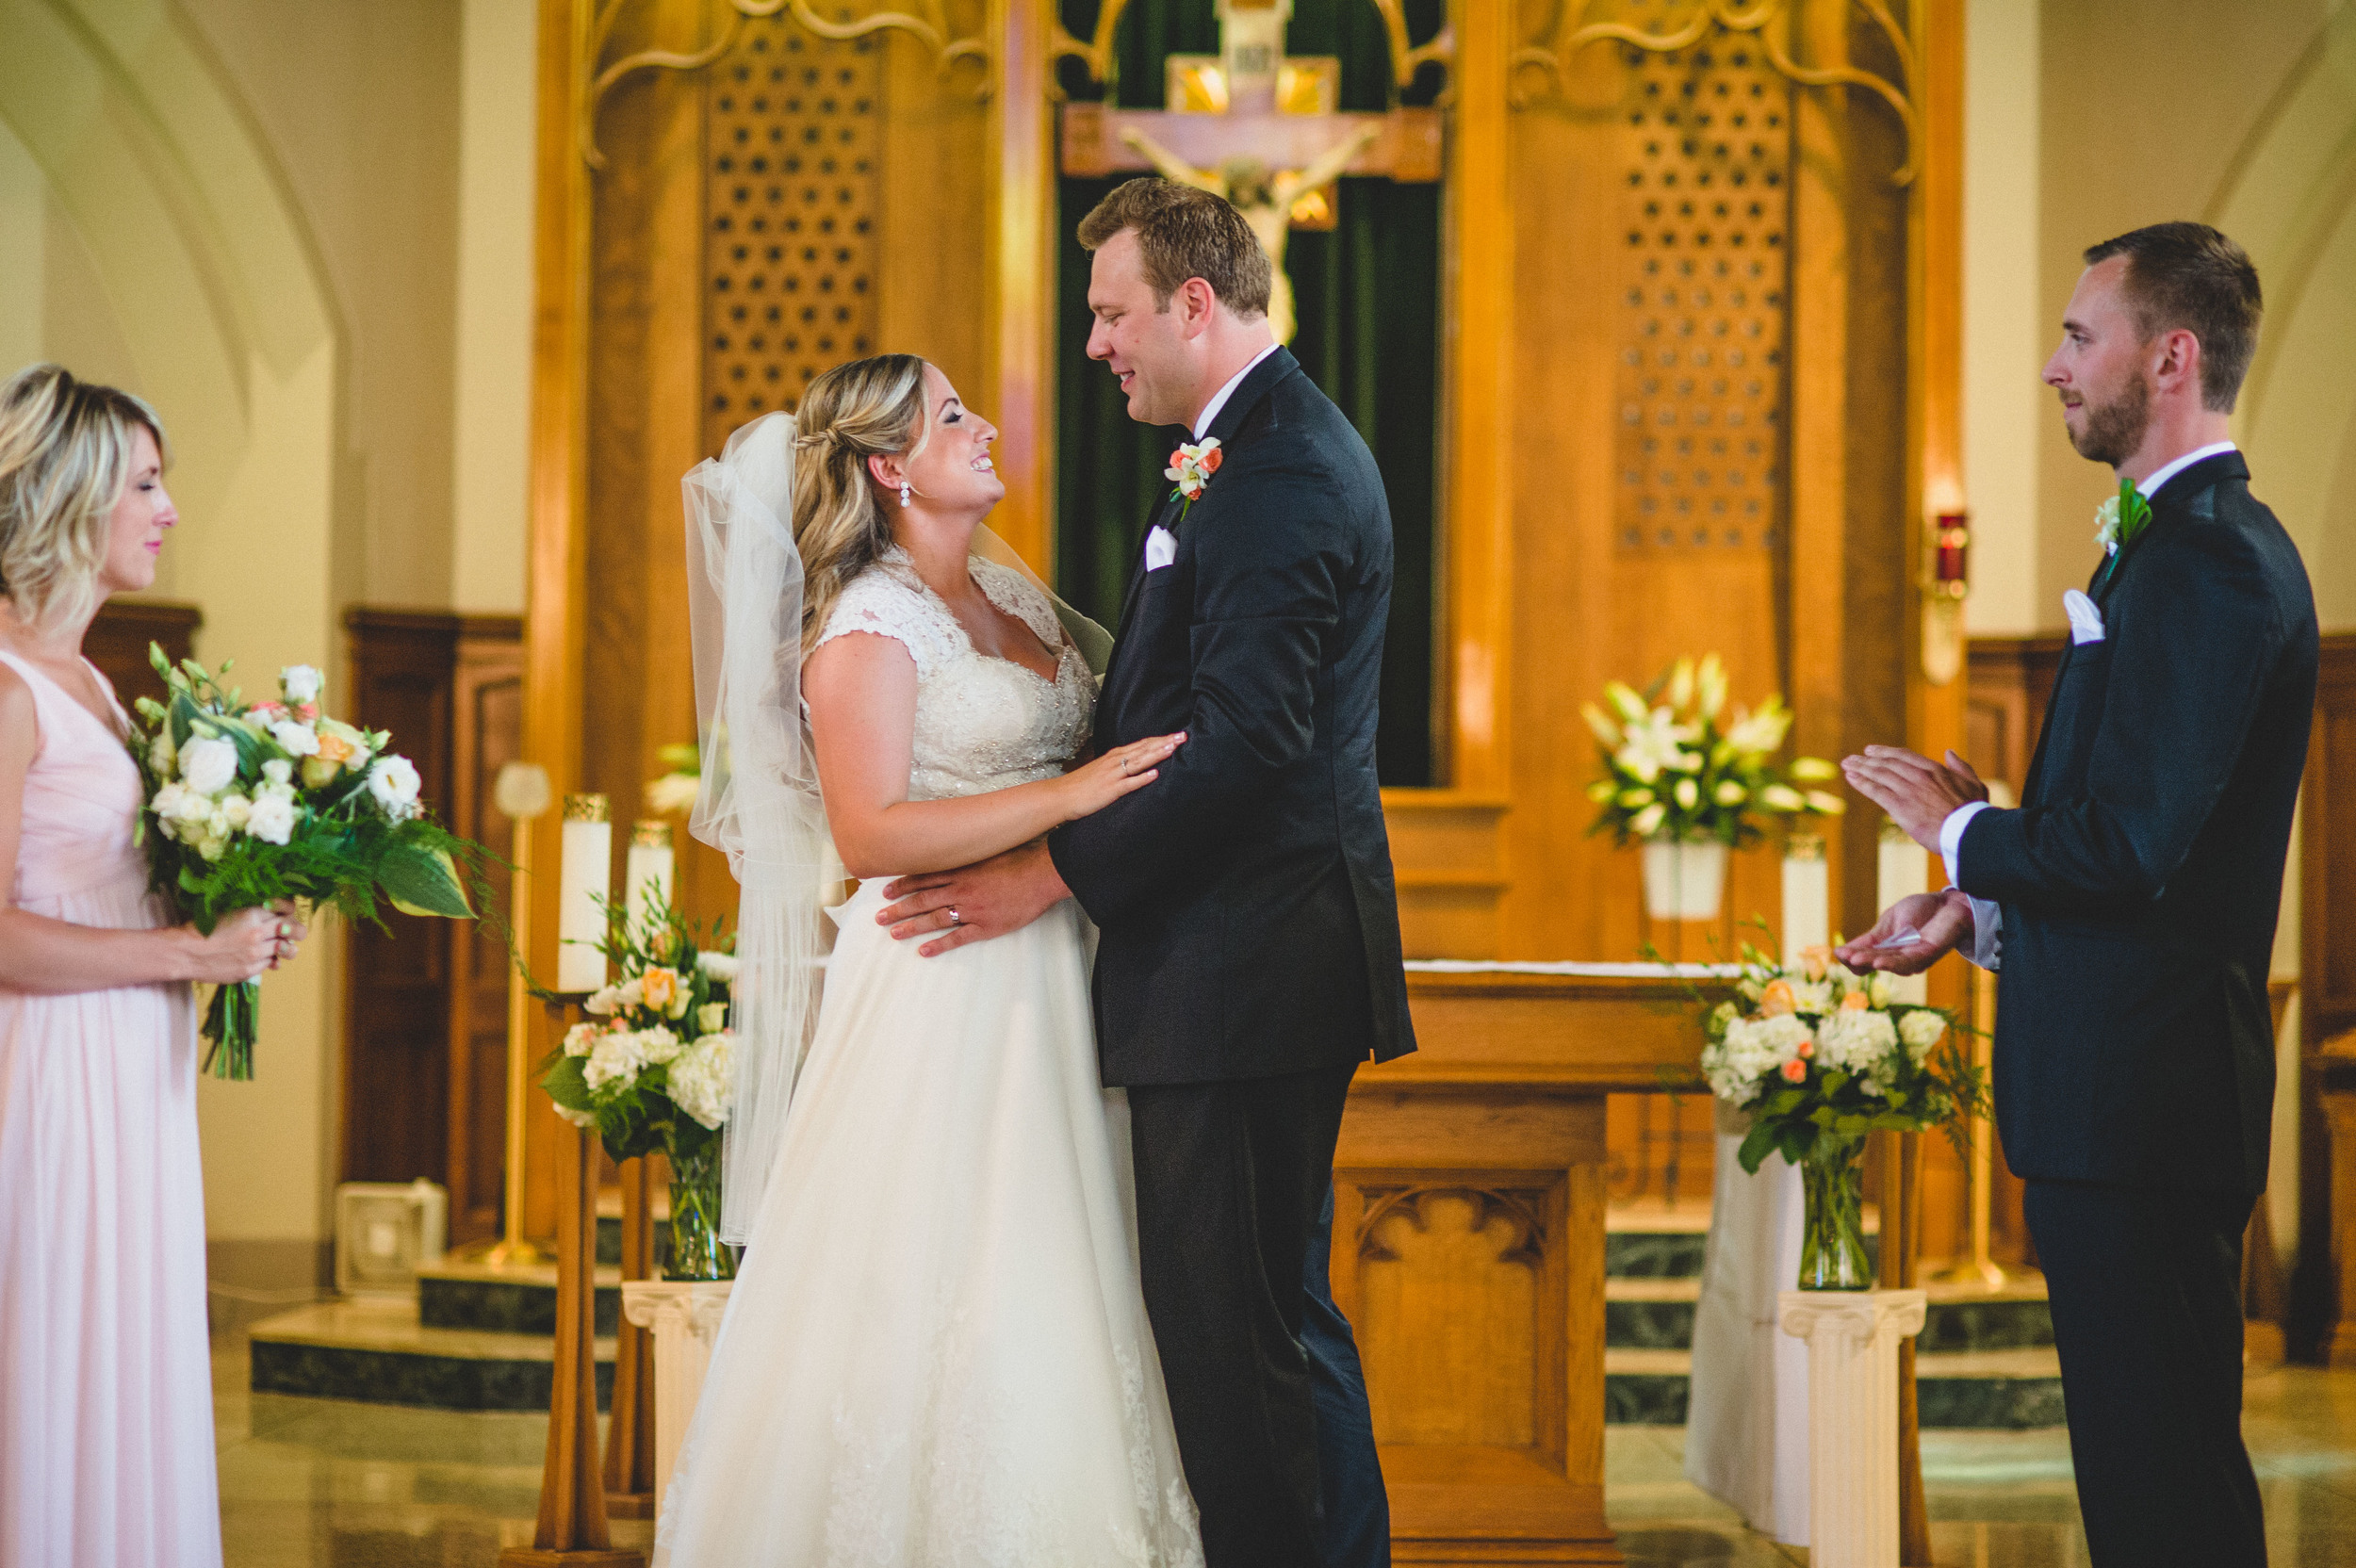 Vancouver St Augustine 's Church wedding photographer edward lai photography-47.jpg